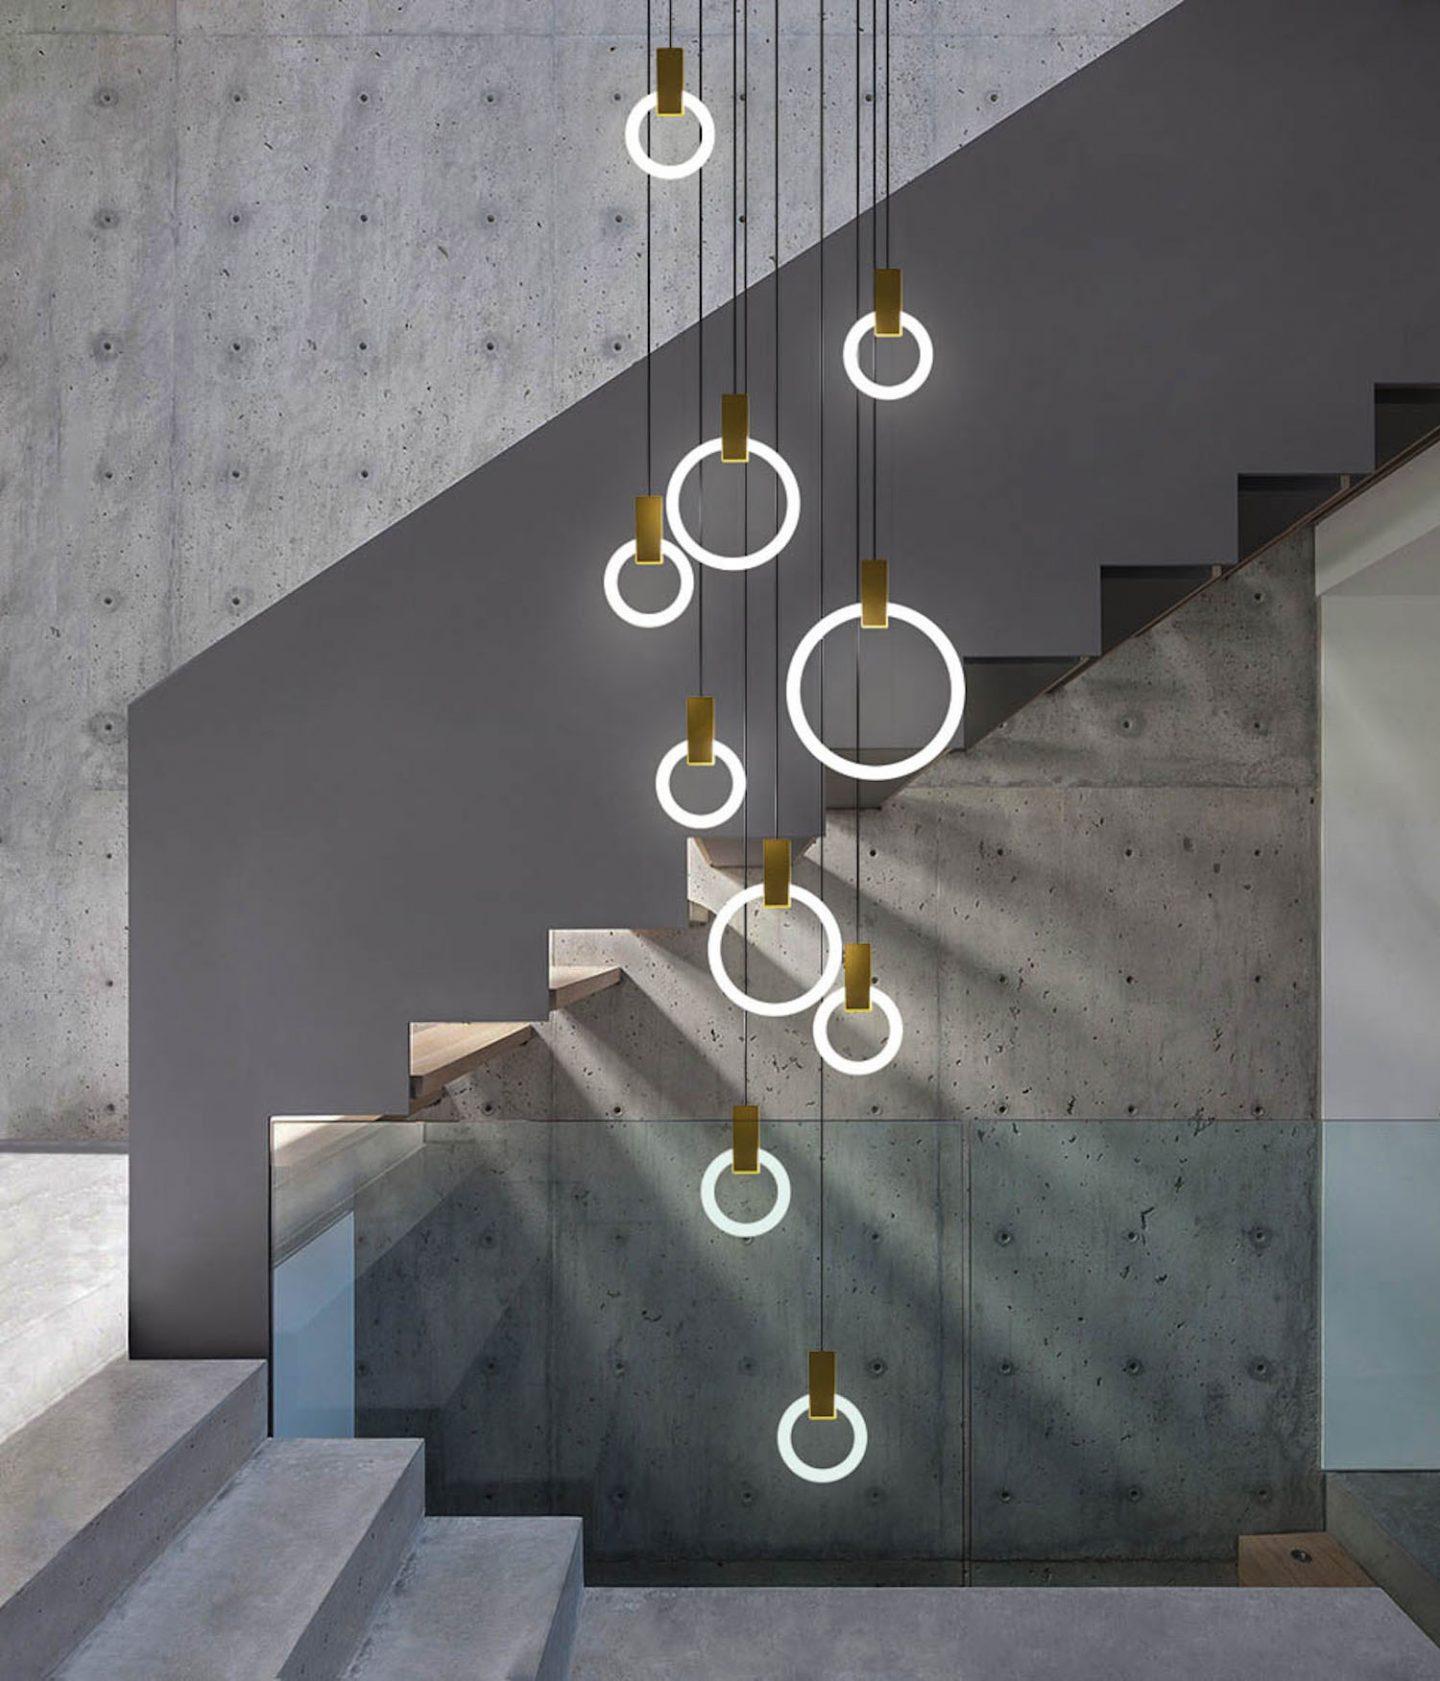 Design_Halo_Lamp_Matthew_McCormick_Studio_15